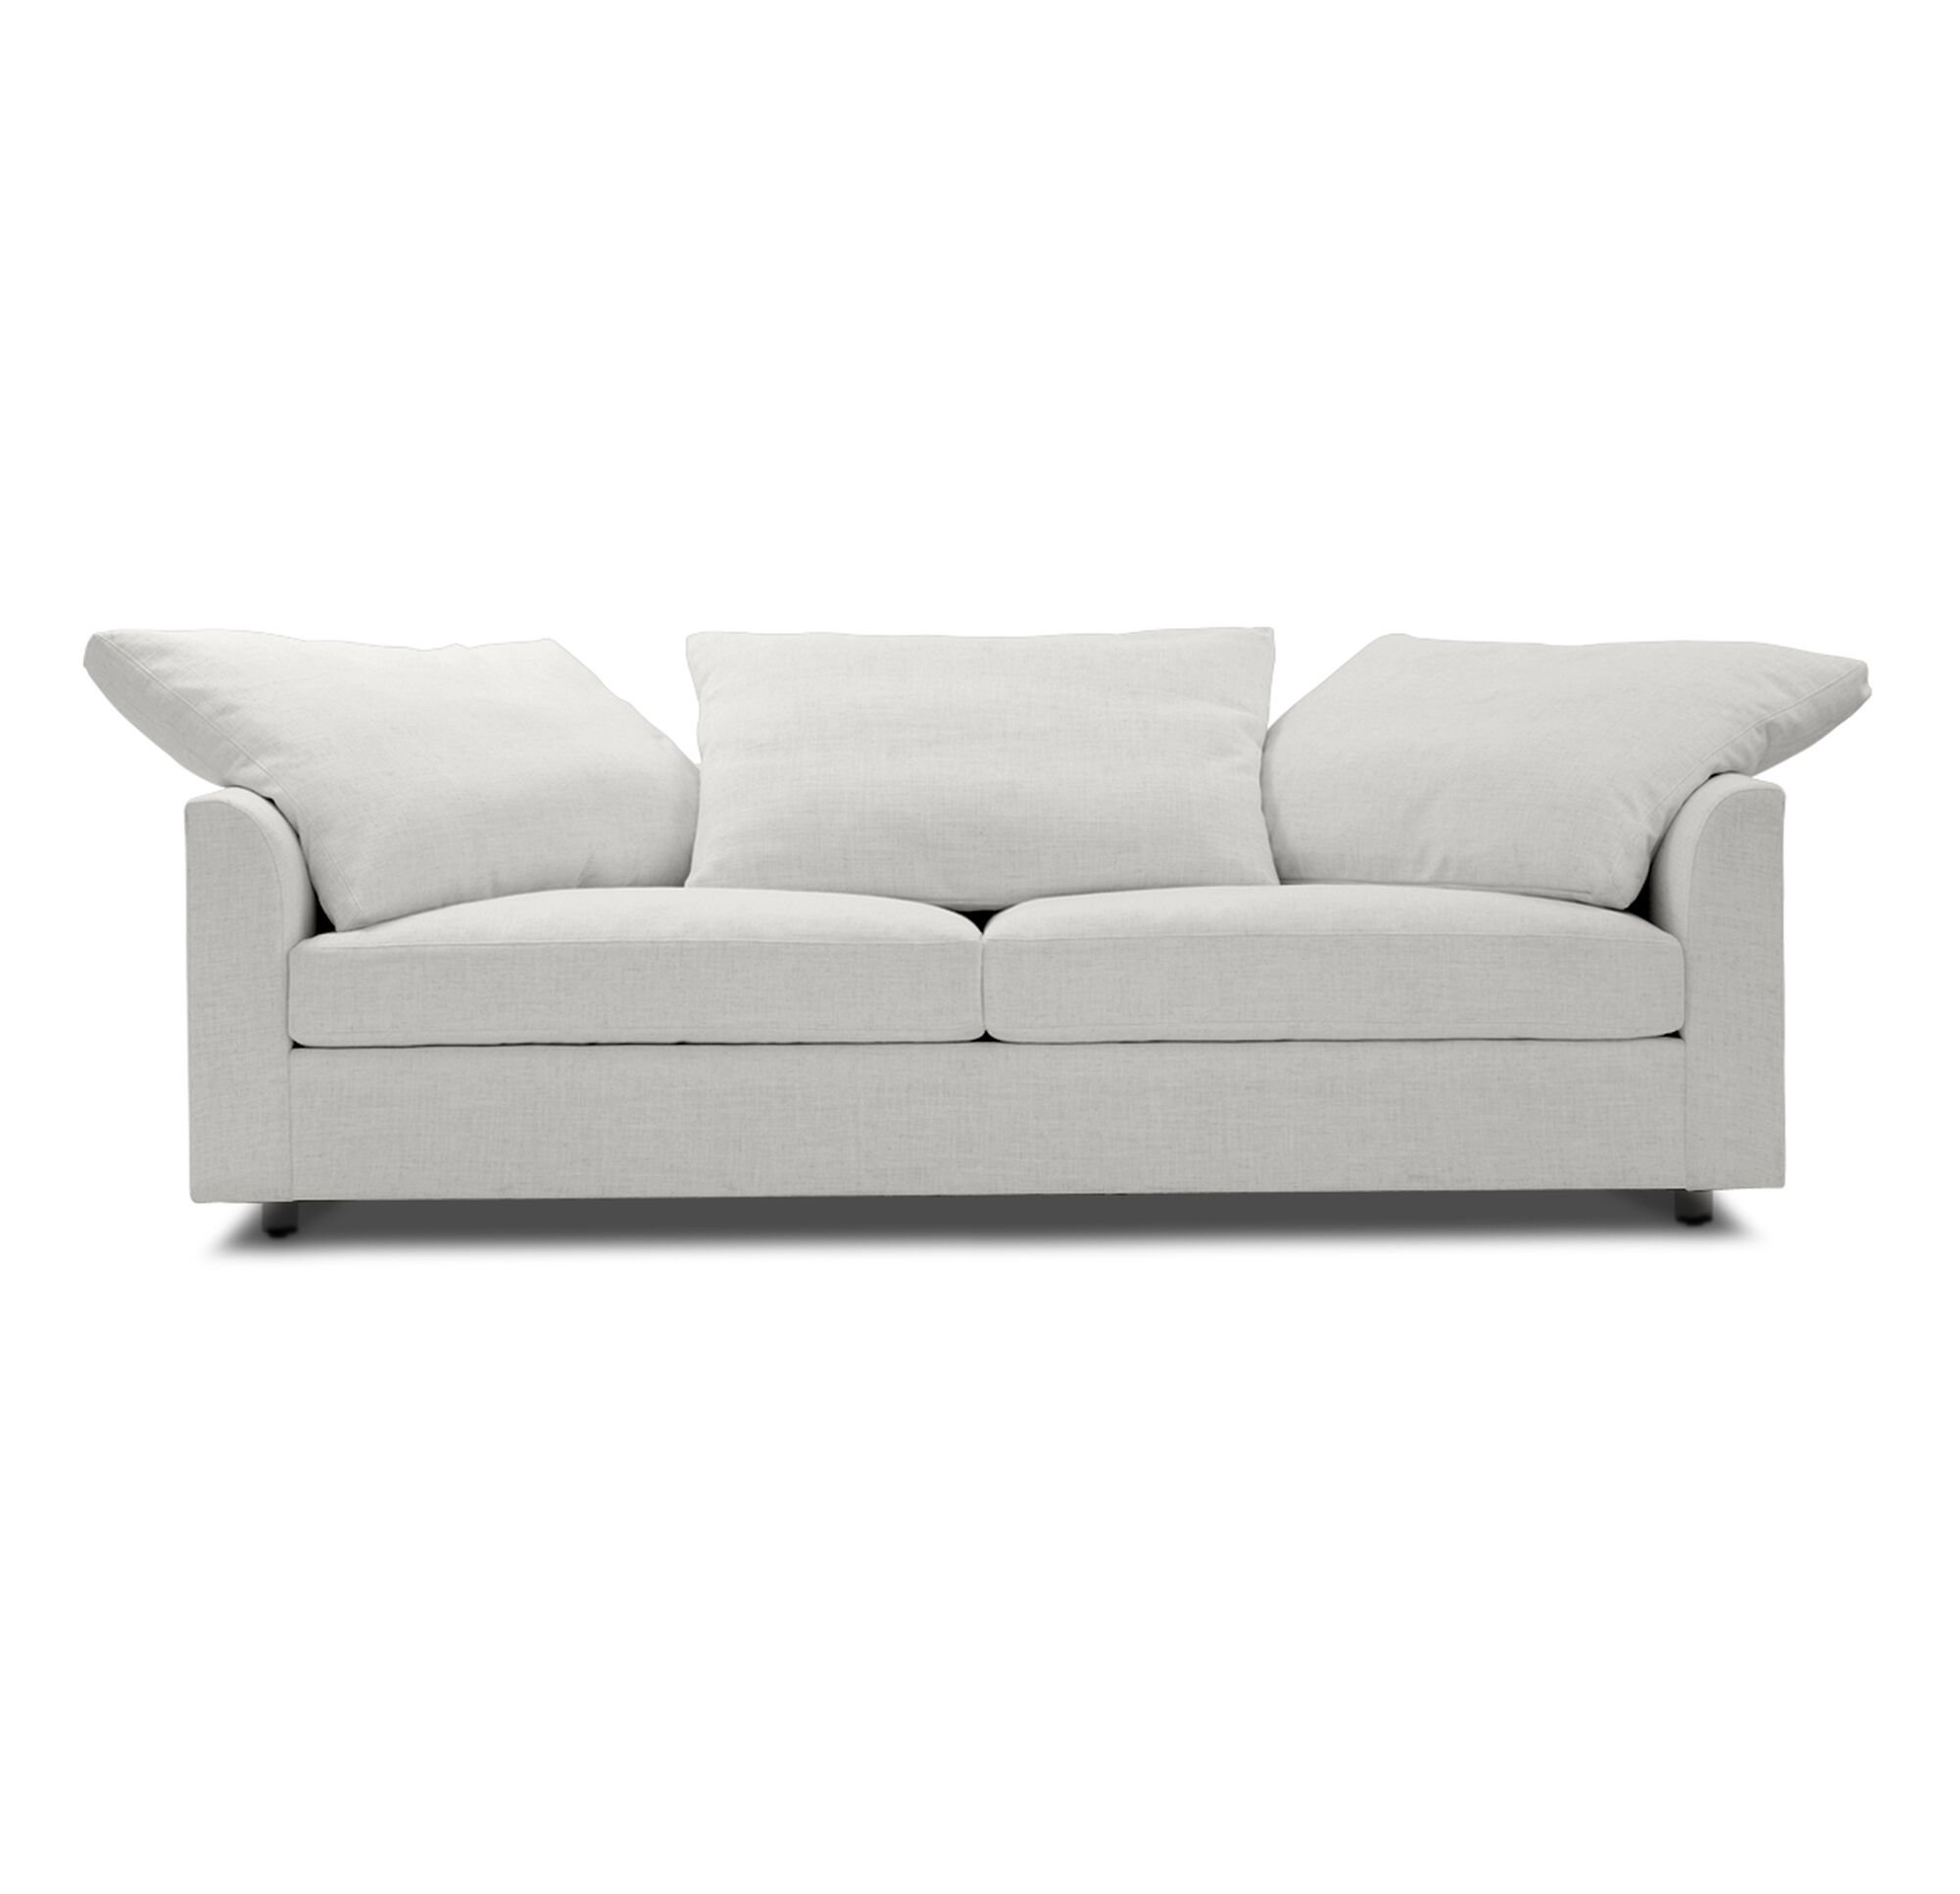 sofa big, big easy sofa, Design ideen